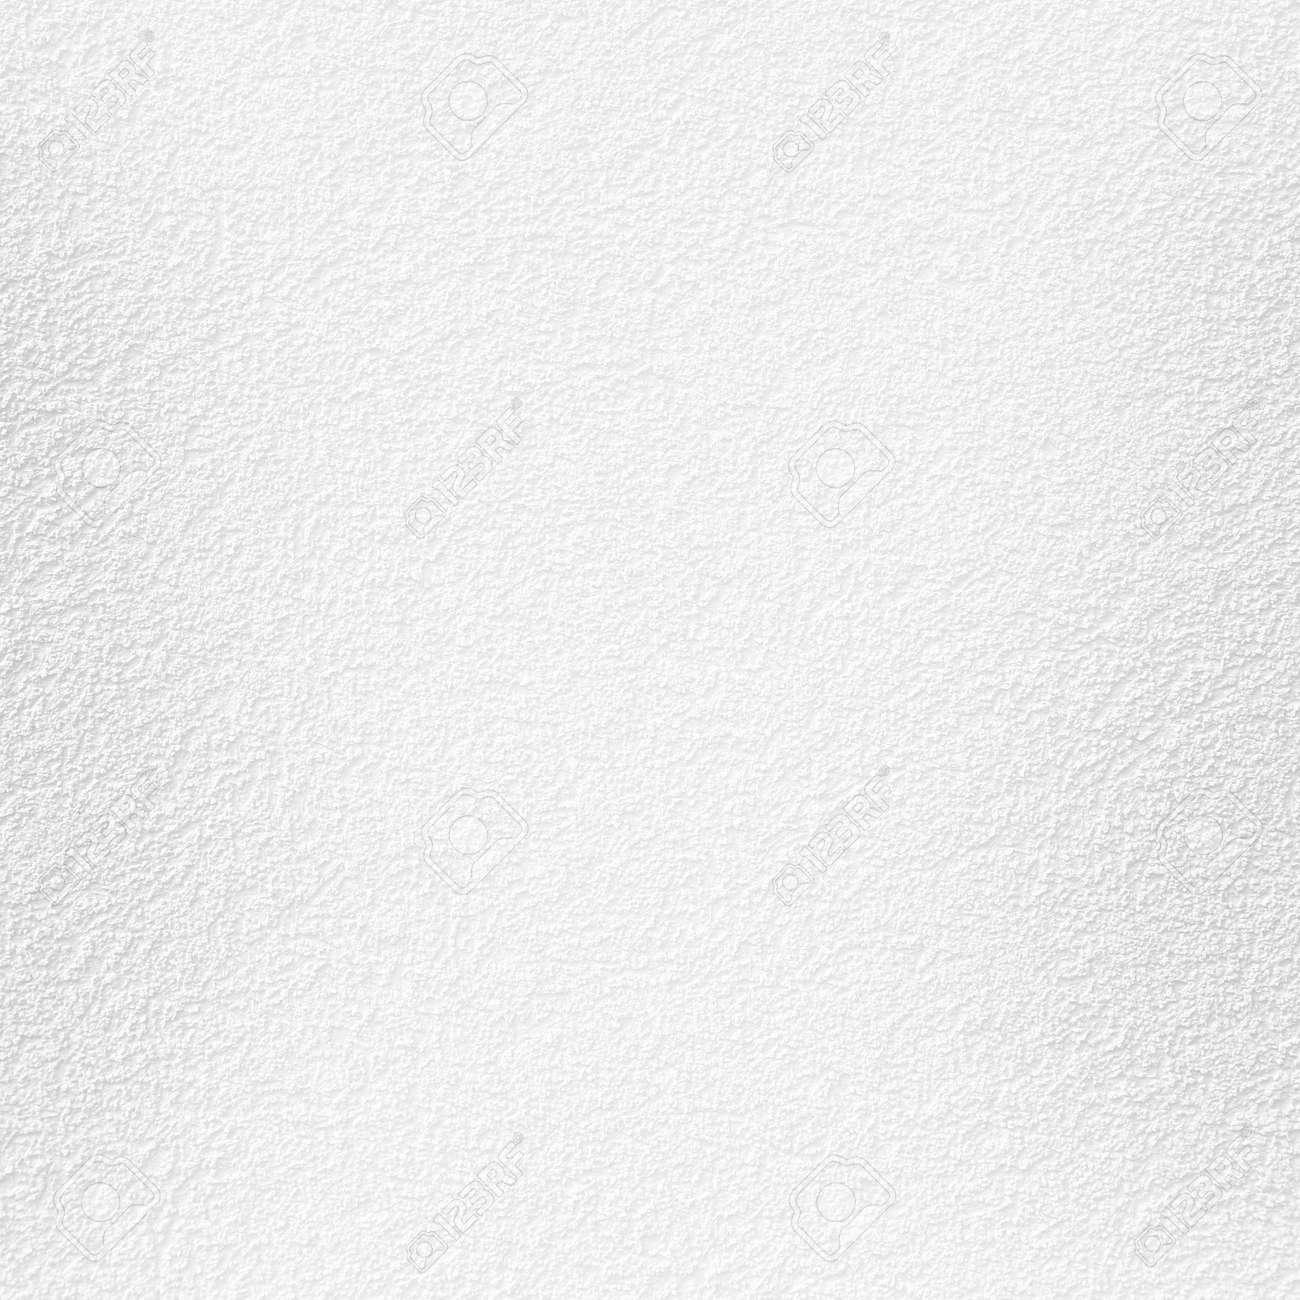 white background grain texture Stock Photo - 40982588